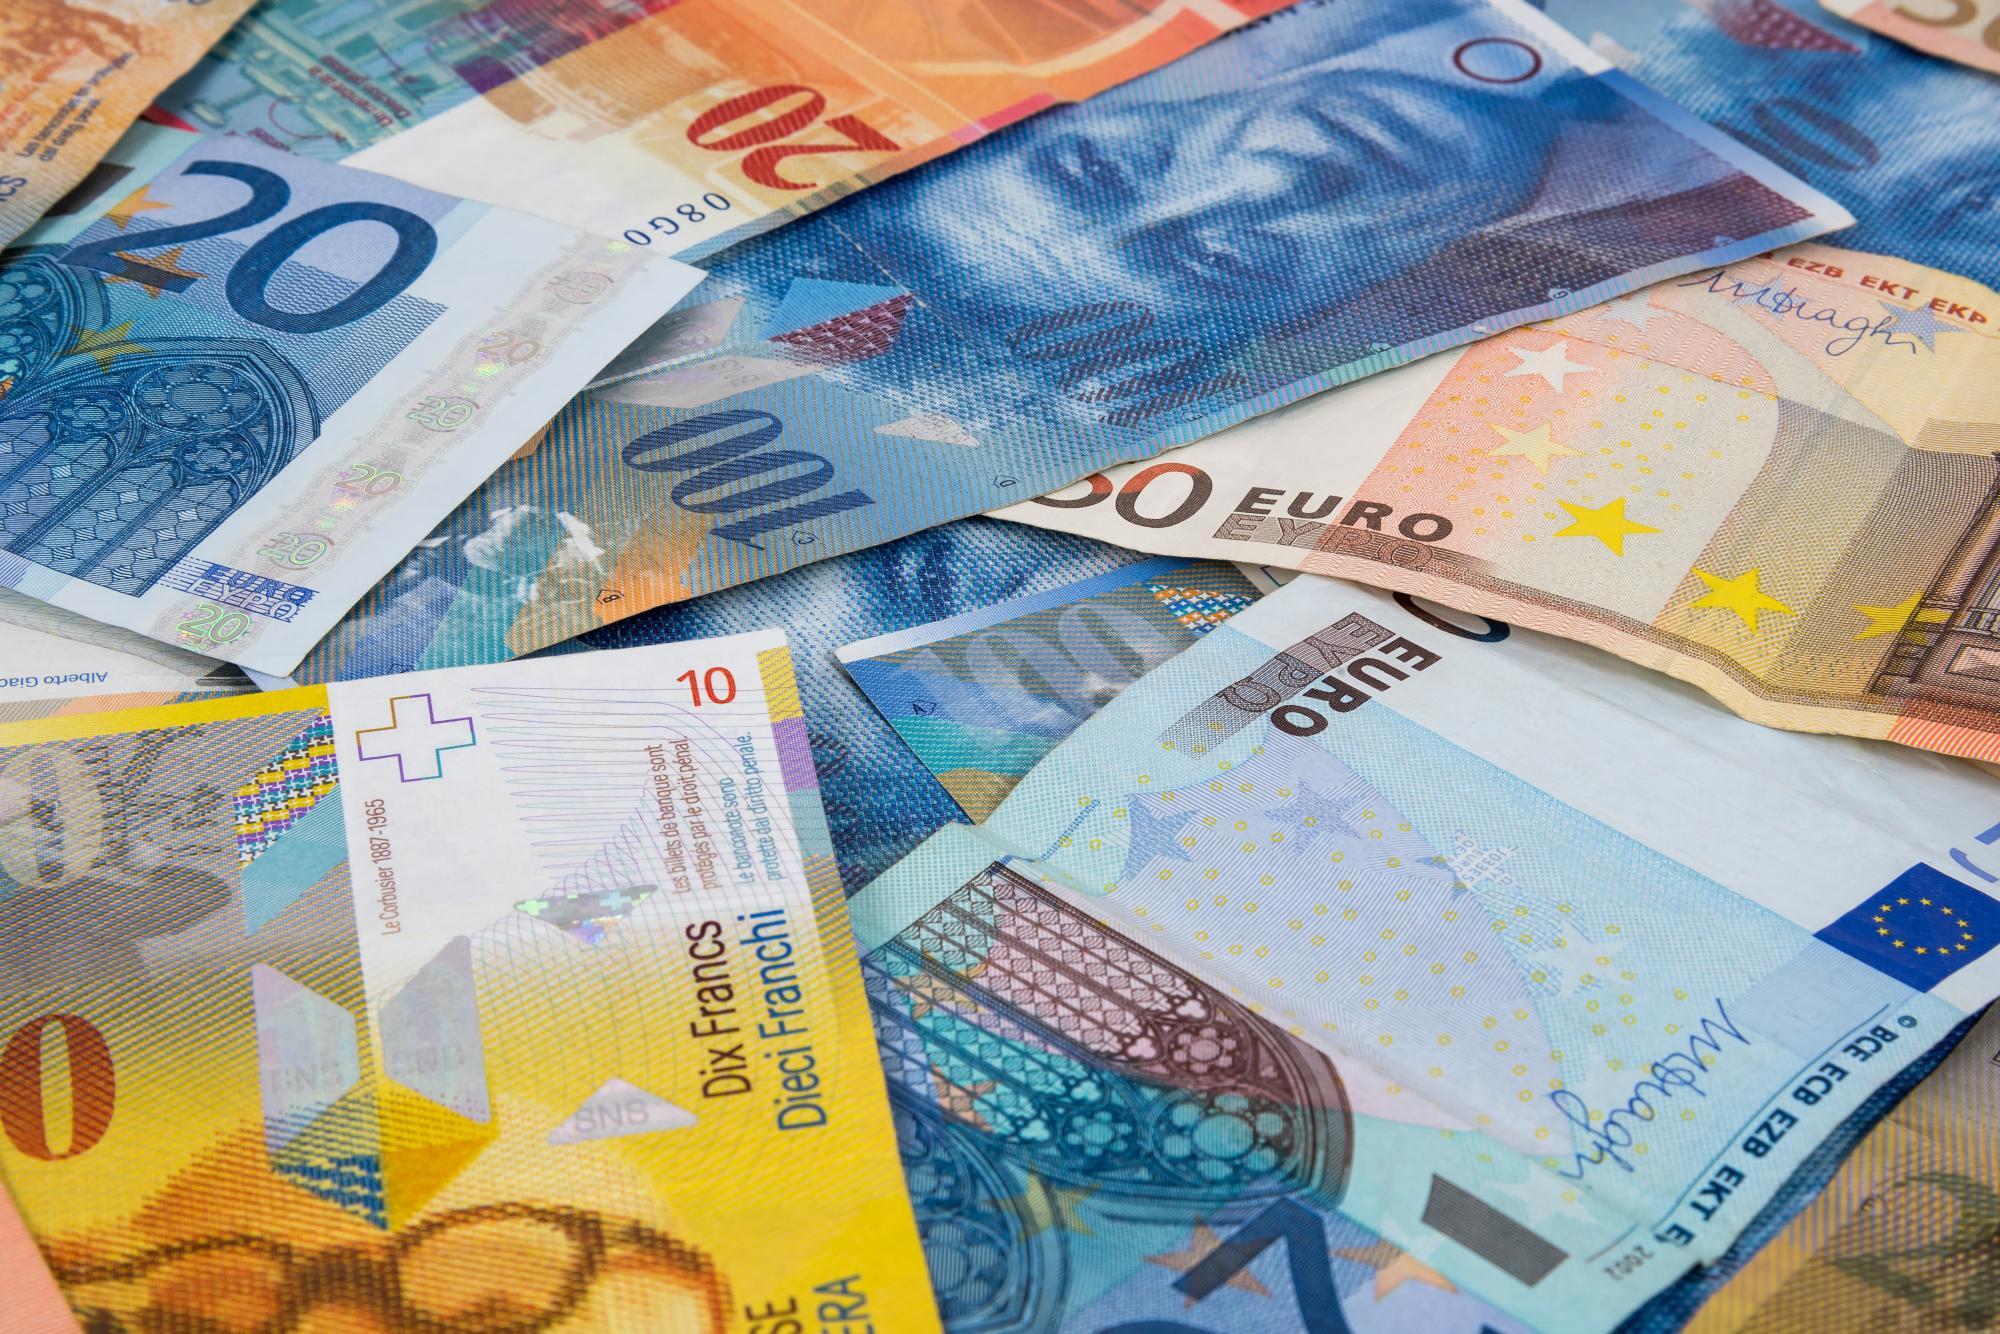 HMRC последний раз предупредило владельцев швейцарских счетов